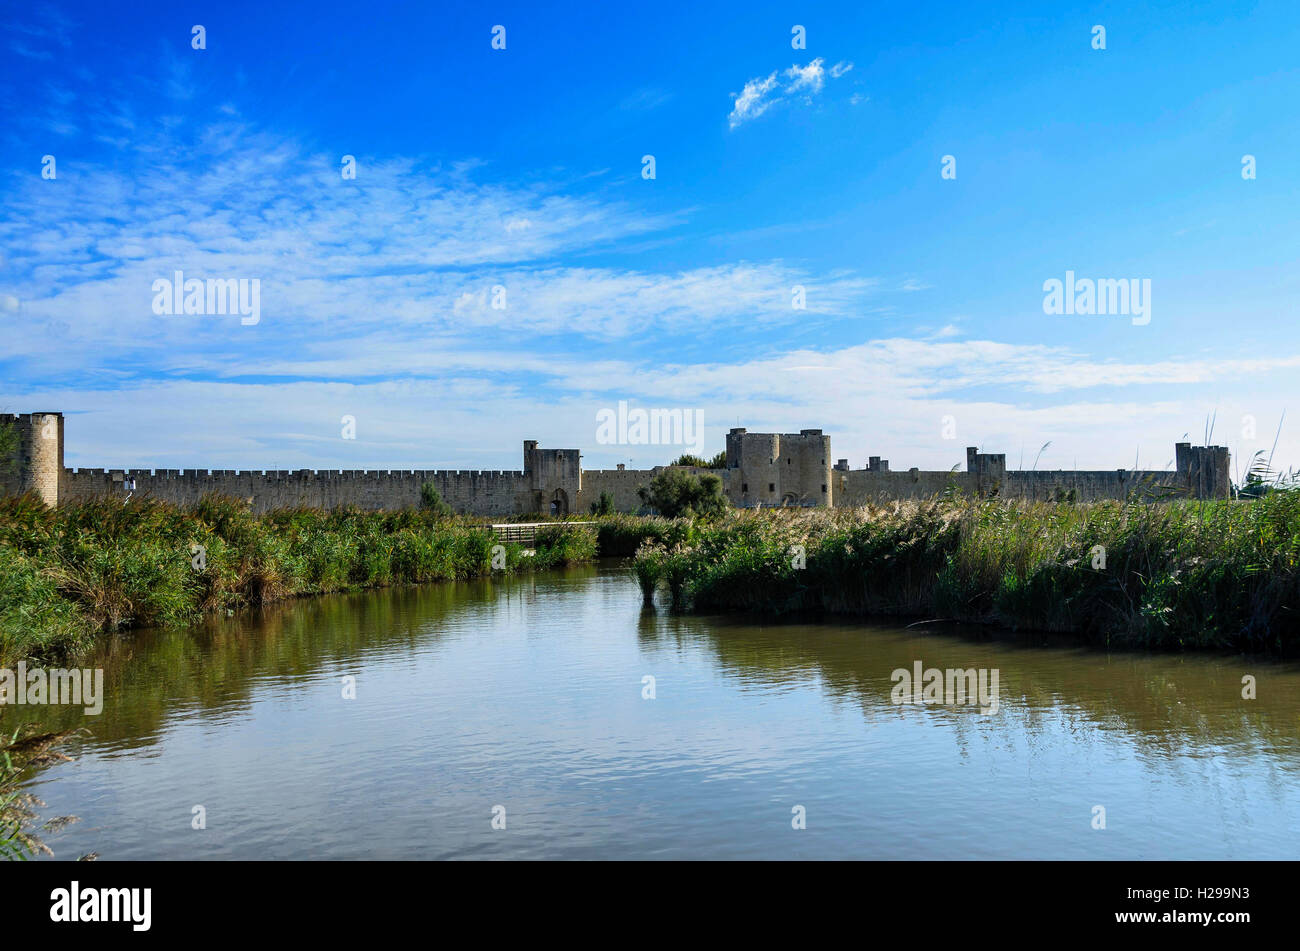 Aigues Mortes, remparts, Gard, France - Stock Image